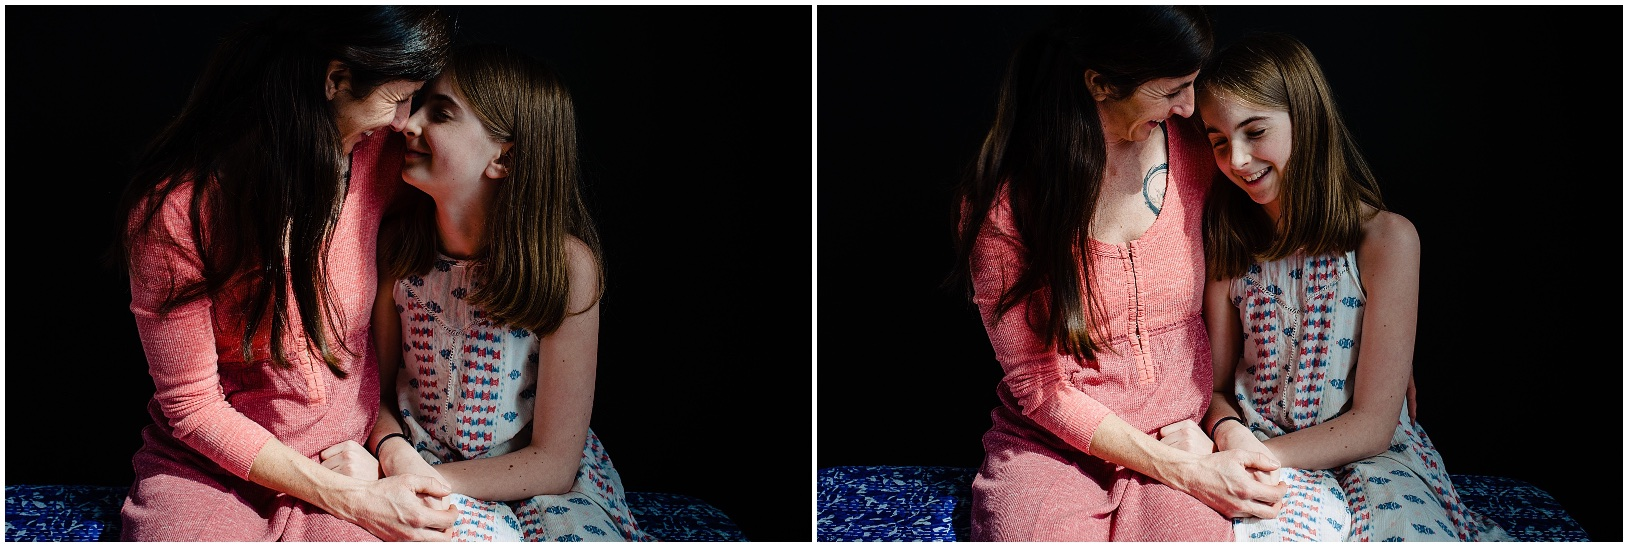 lindseyjanephotography_portraits004.jpg